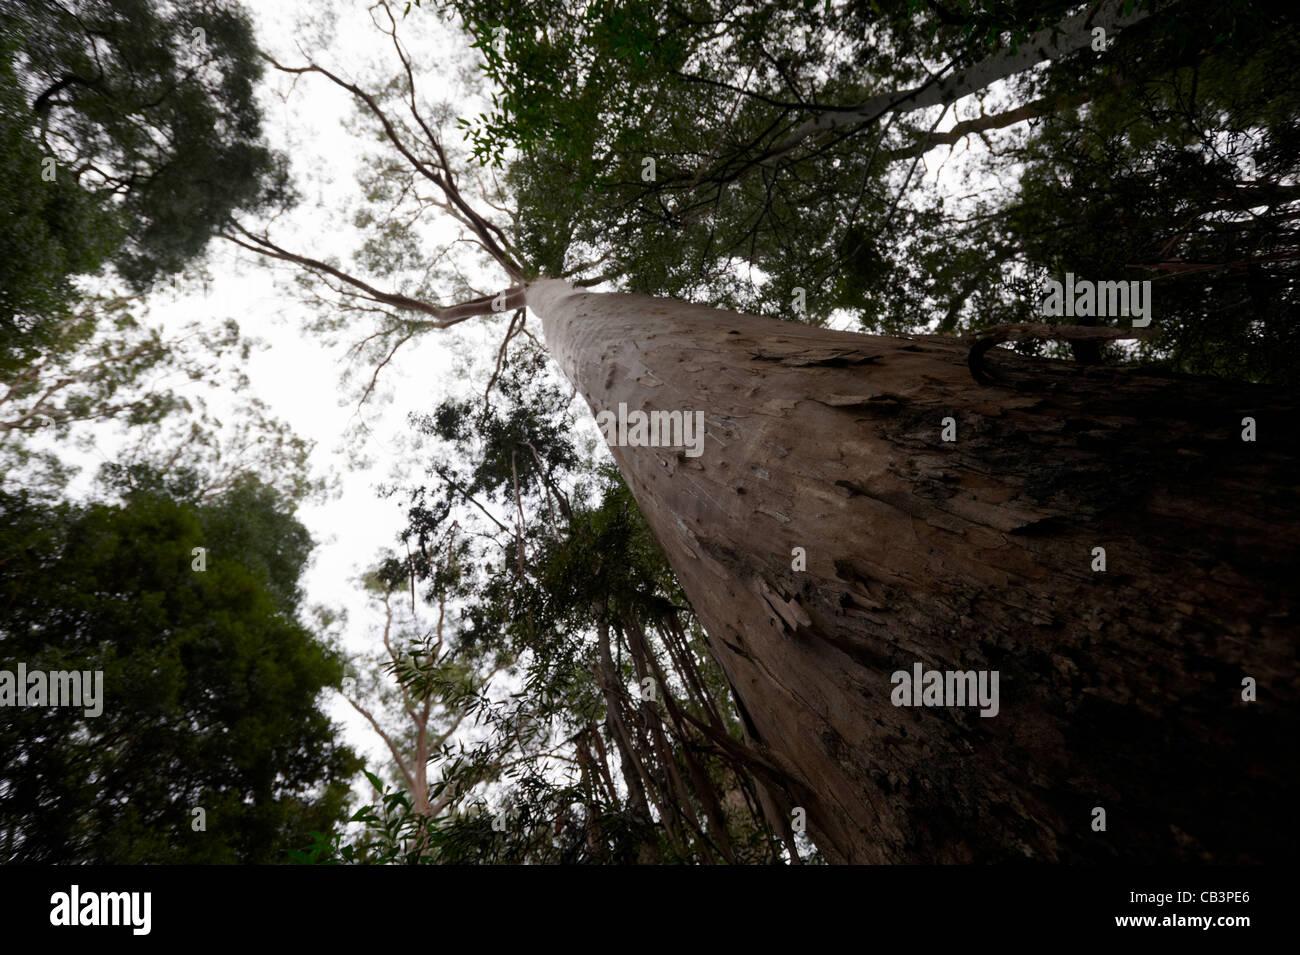 Eucalyptus regnans tree towers above canopy, Peoples Park, Strahan, Tasmania, Australia - Stock Image